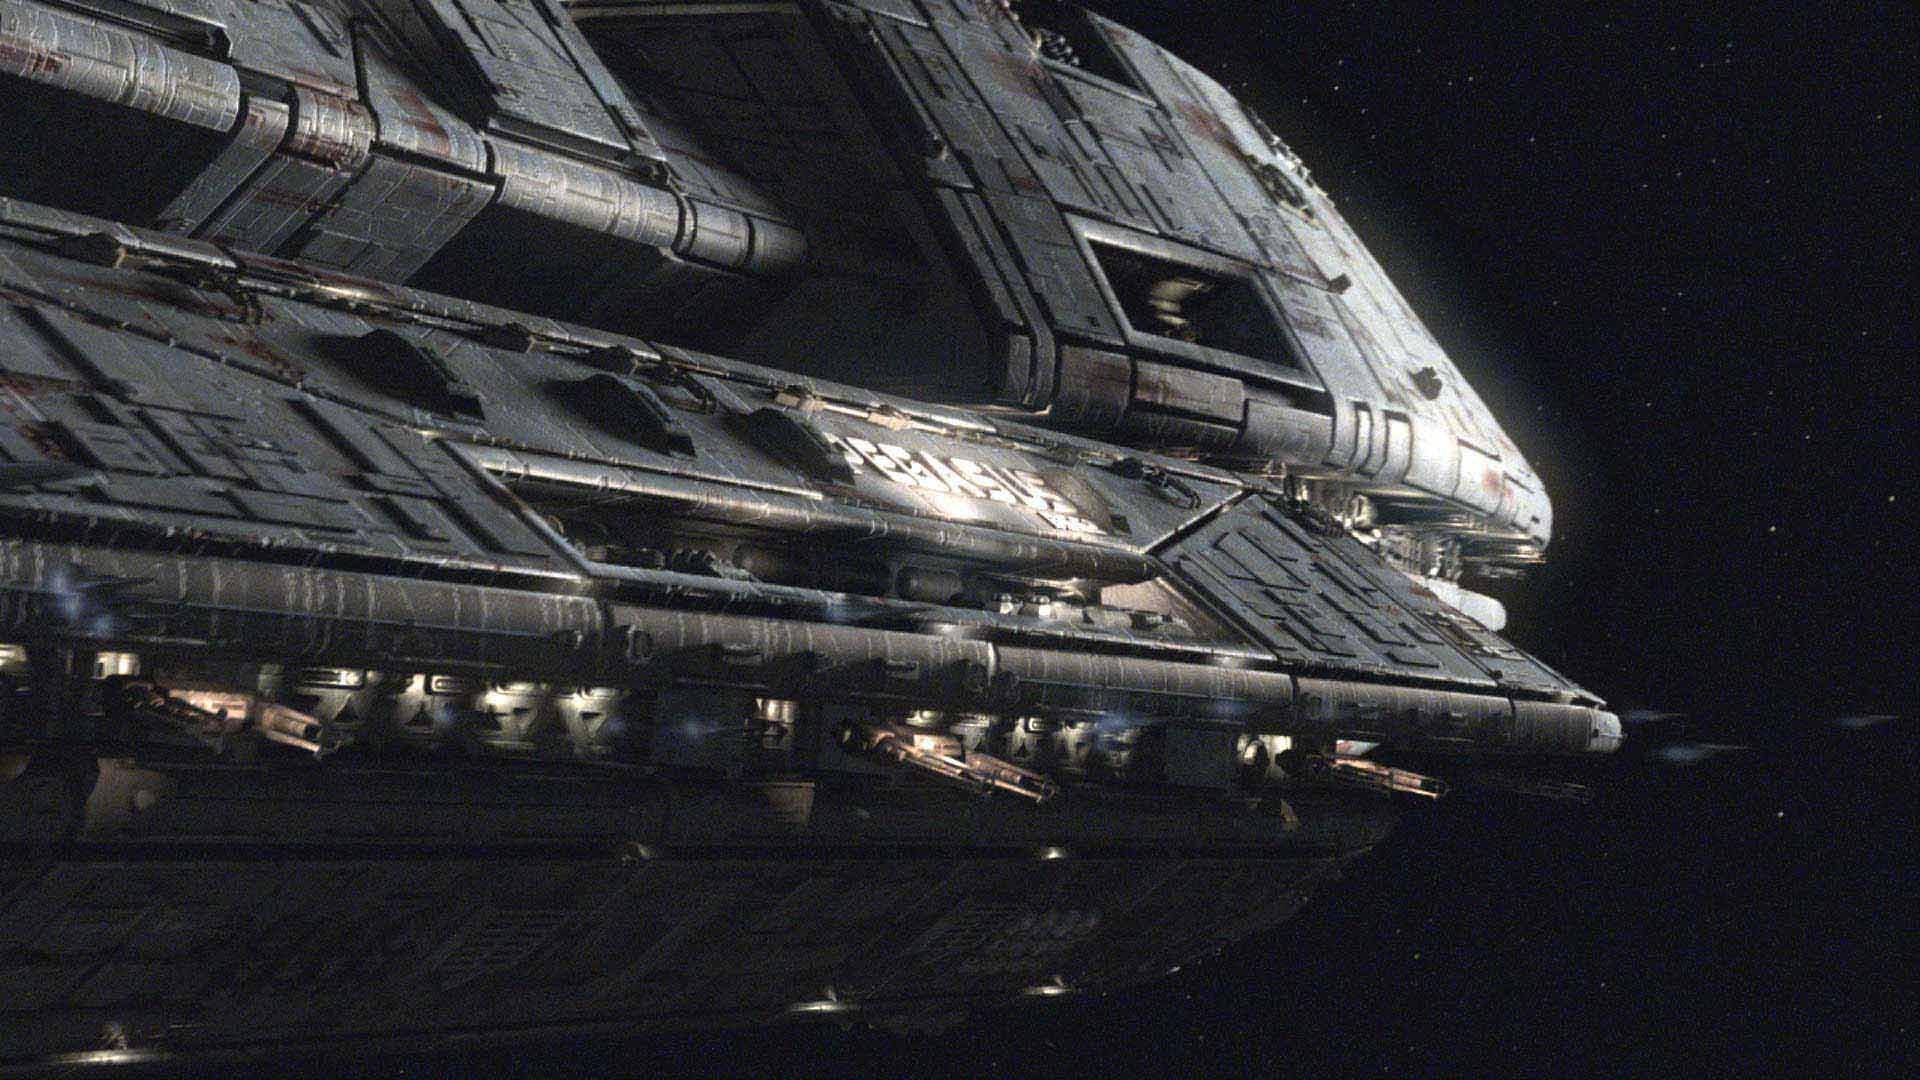 BATTLESTAR GALACTICA action adventure drama sci-fi spaceship wallpaper      264978   WallpaperUP